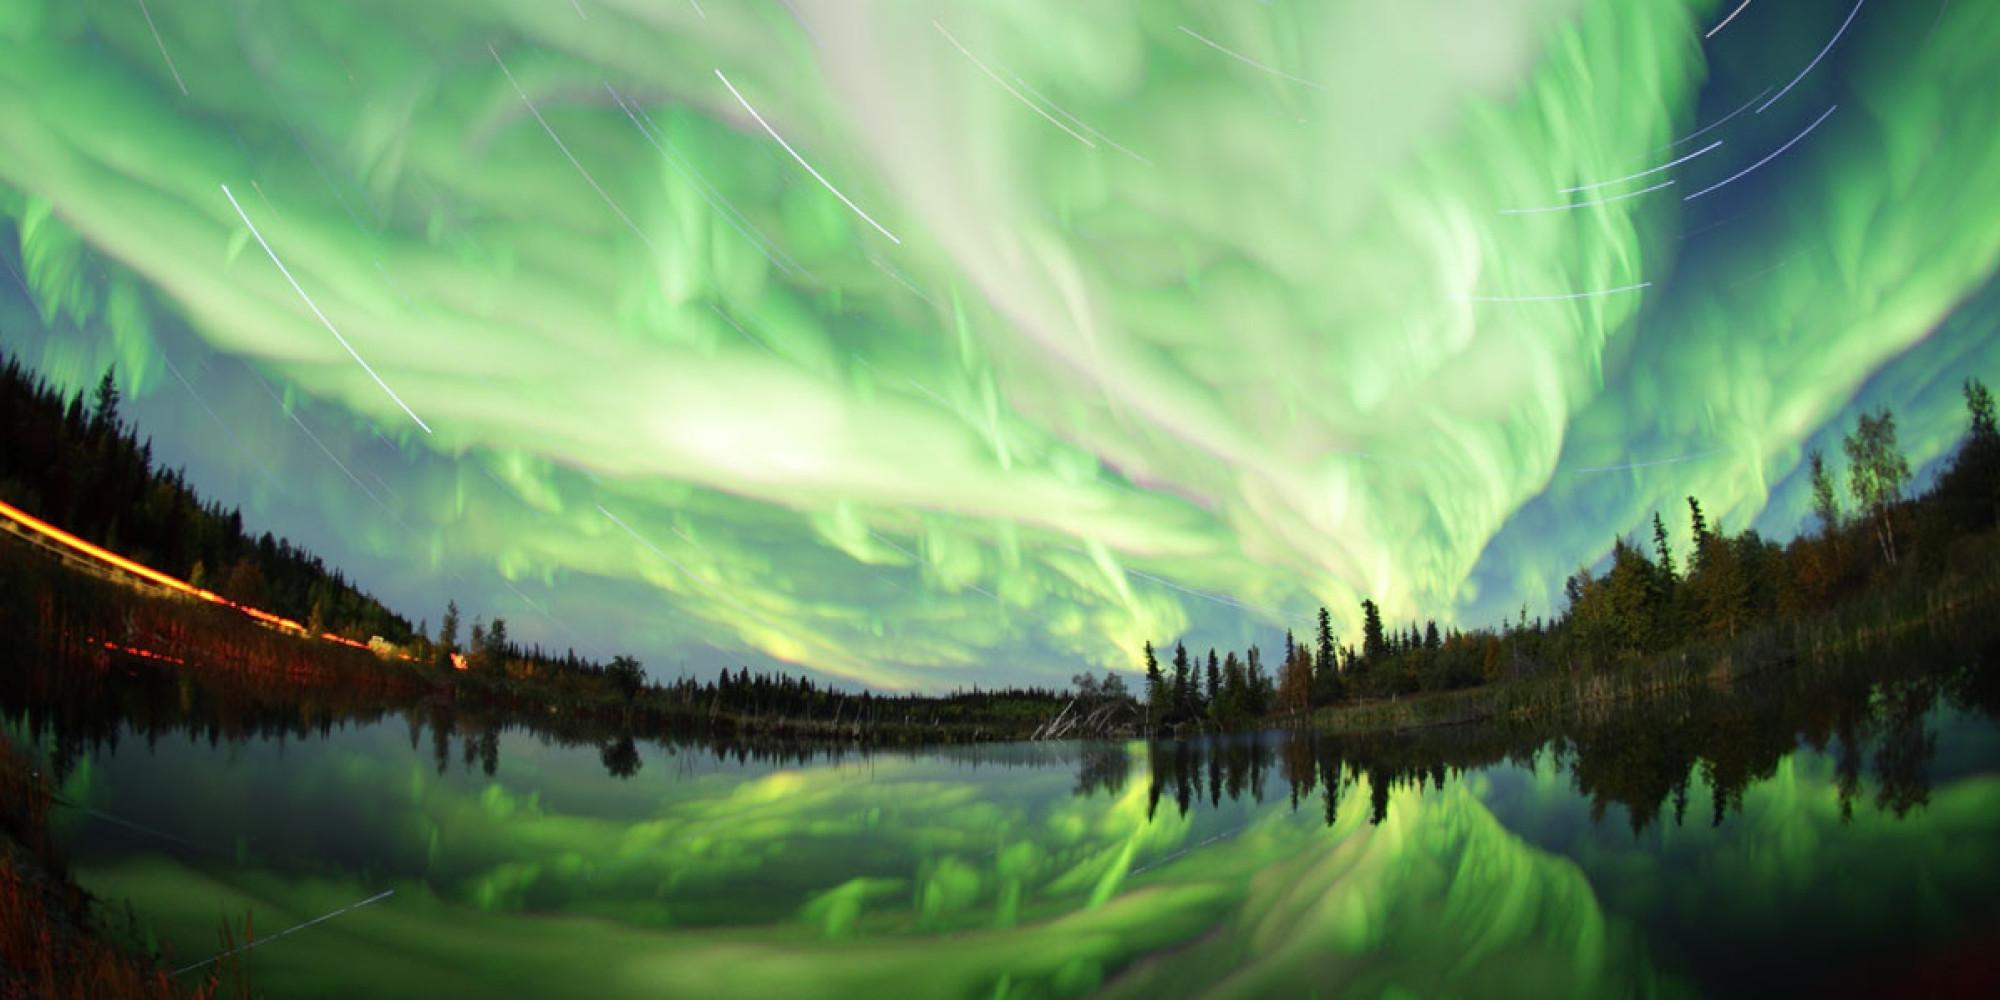 Northern lights photos by yuichi takasaka are incredible